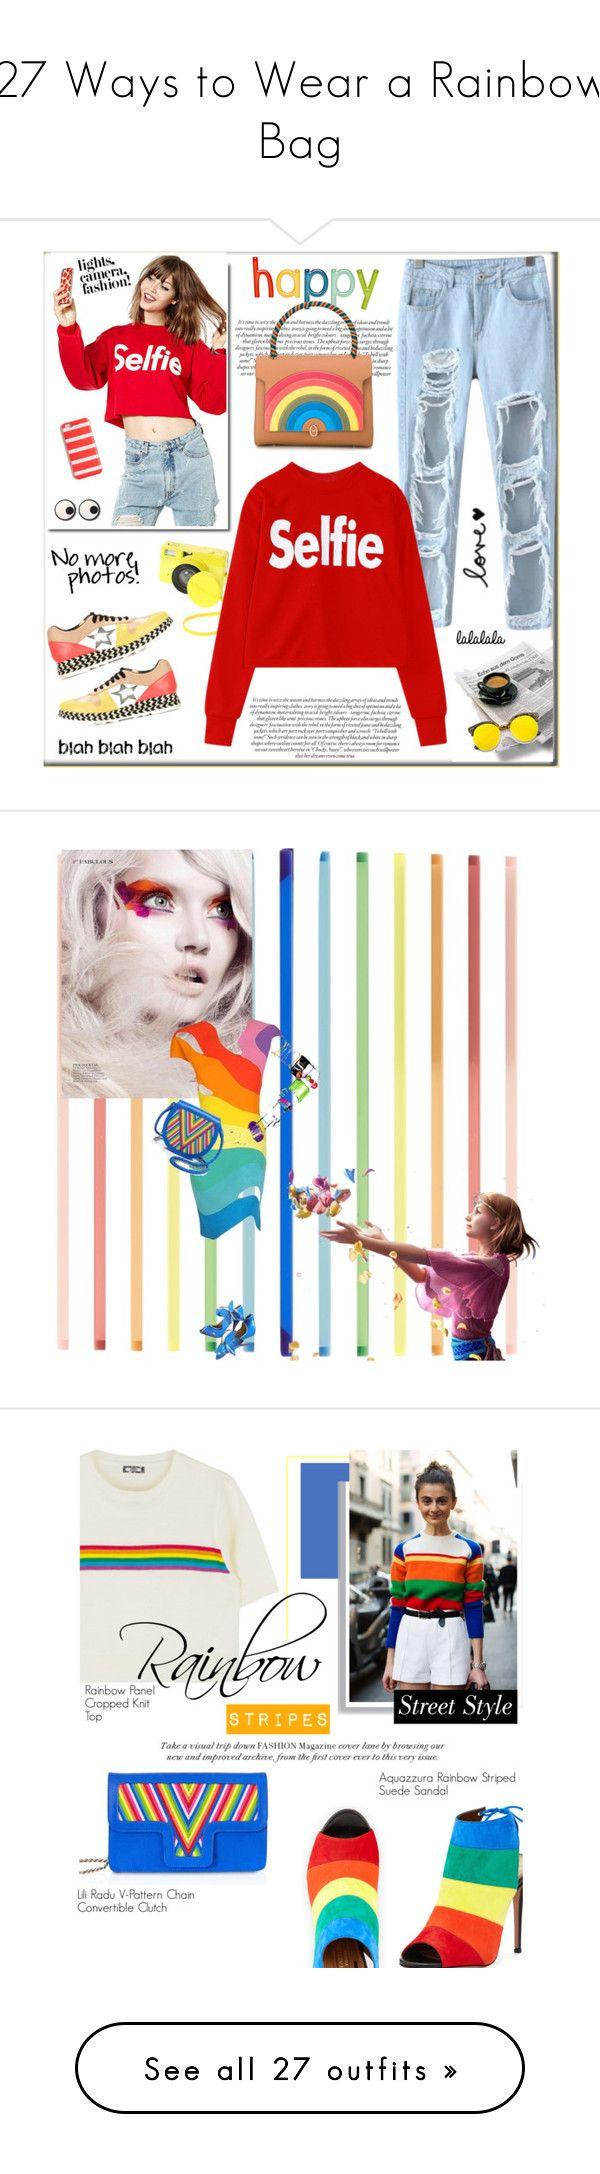 """27 Ways to Wear a Rainbow Bag"" by polyvore-editorial ❤ liked on Polyvore featuring waystowear, rainbowbag, Chicnova Fashion, Submarine, STELLA McCARTNEY, Anya Hindmarch, J.Crew, Revo, Mary Katrantzou and Thierry Mugler"